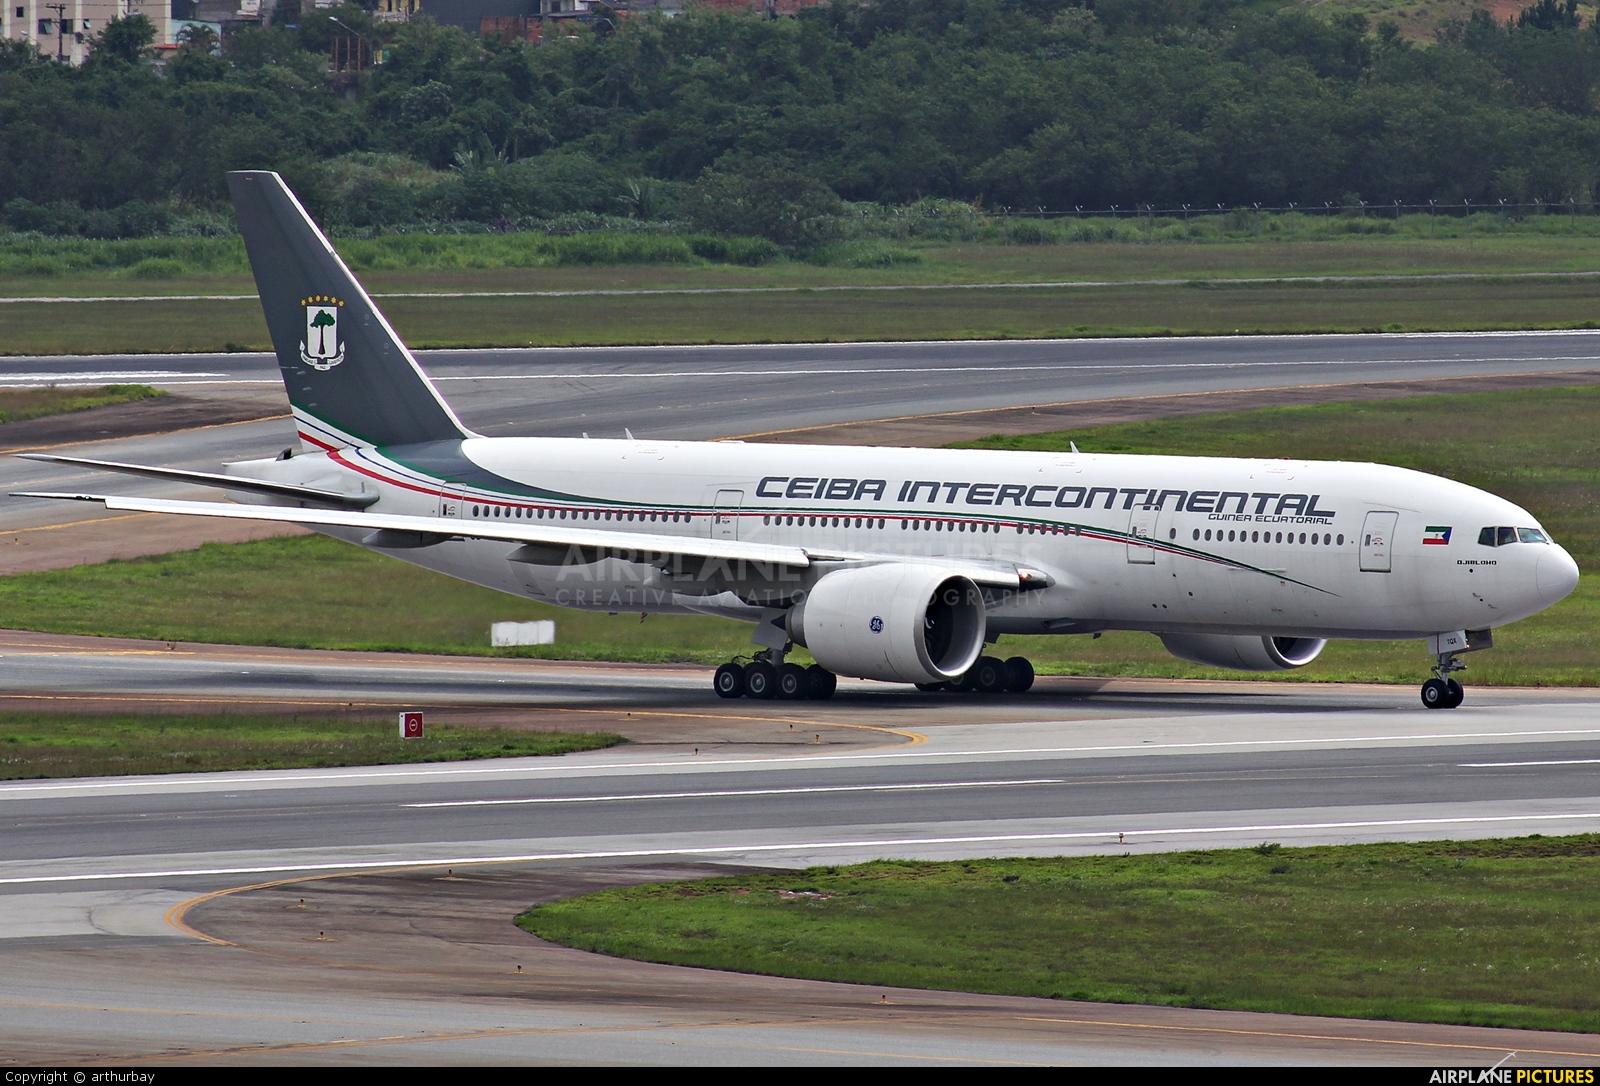 Y Republic Airlines